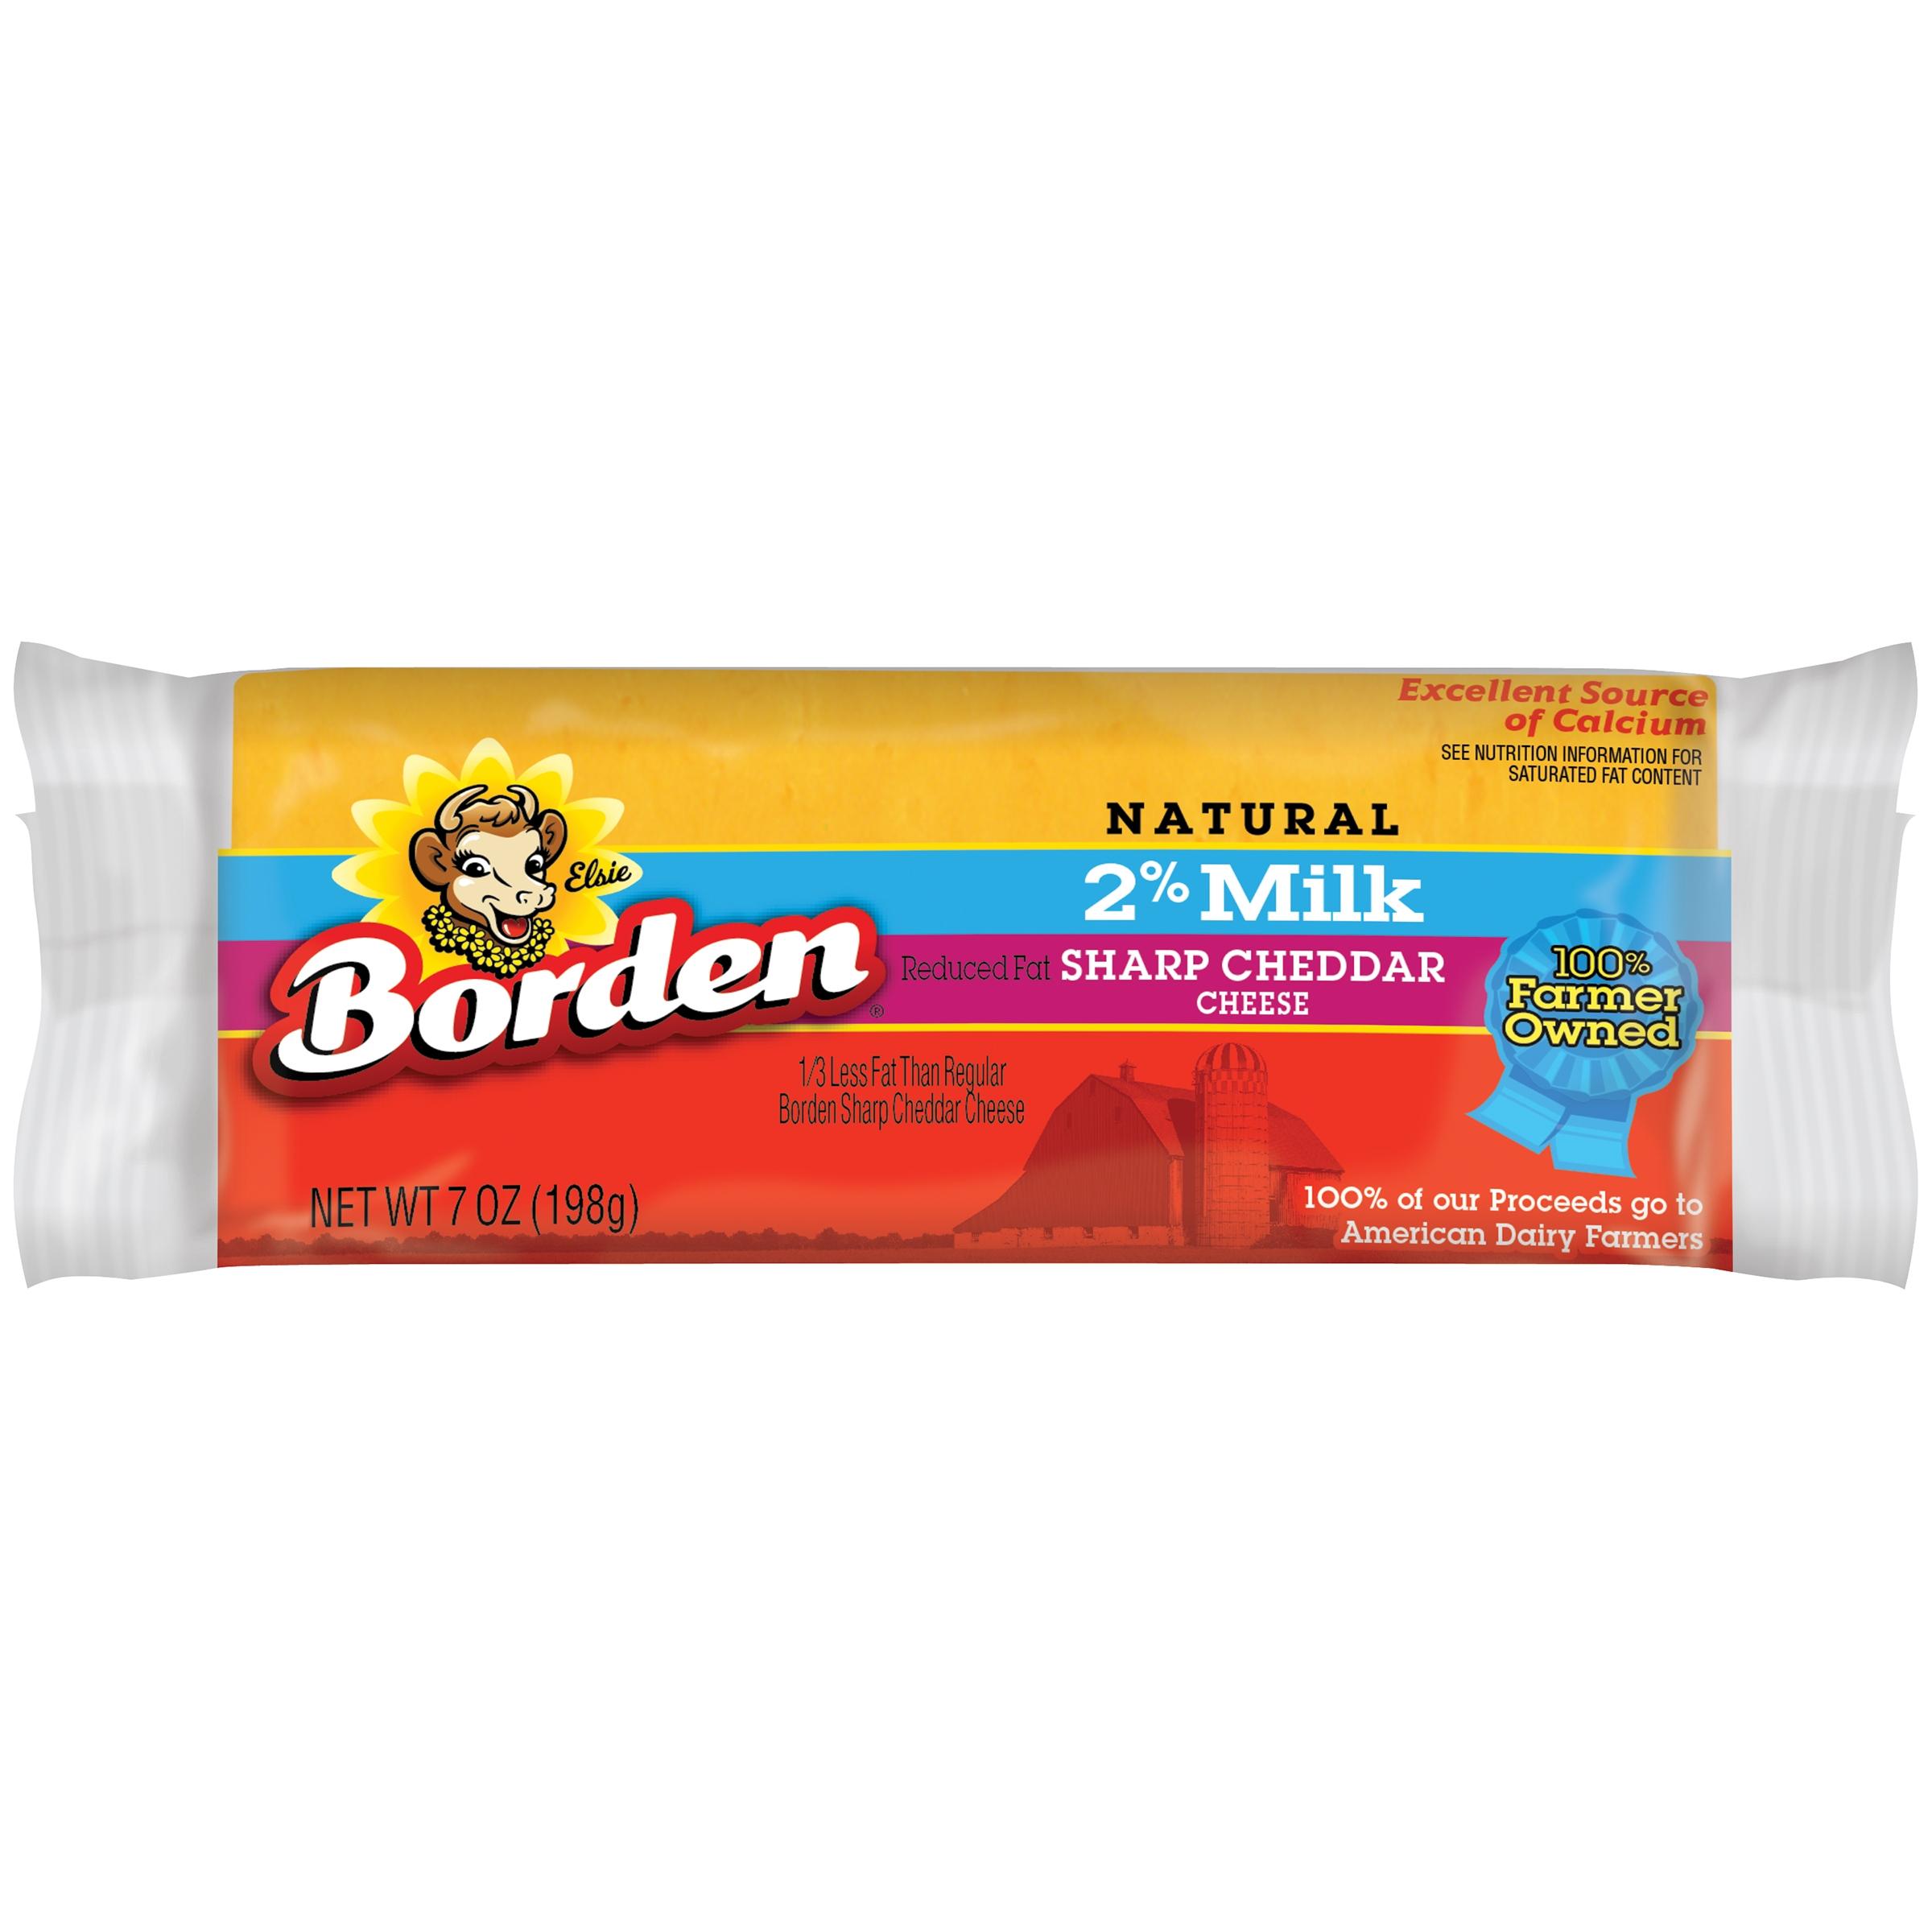 Borden® Natural 2% Milk Sharp Cheddar Cheese 7 oz. Brick